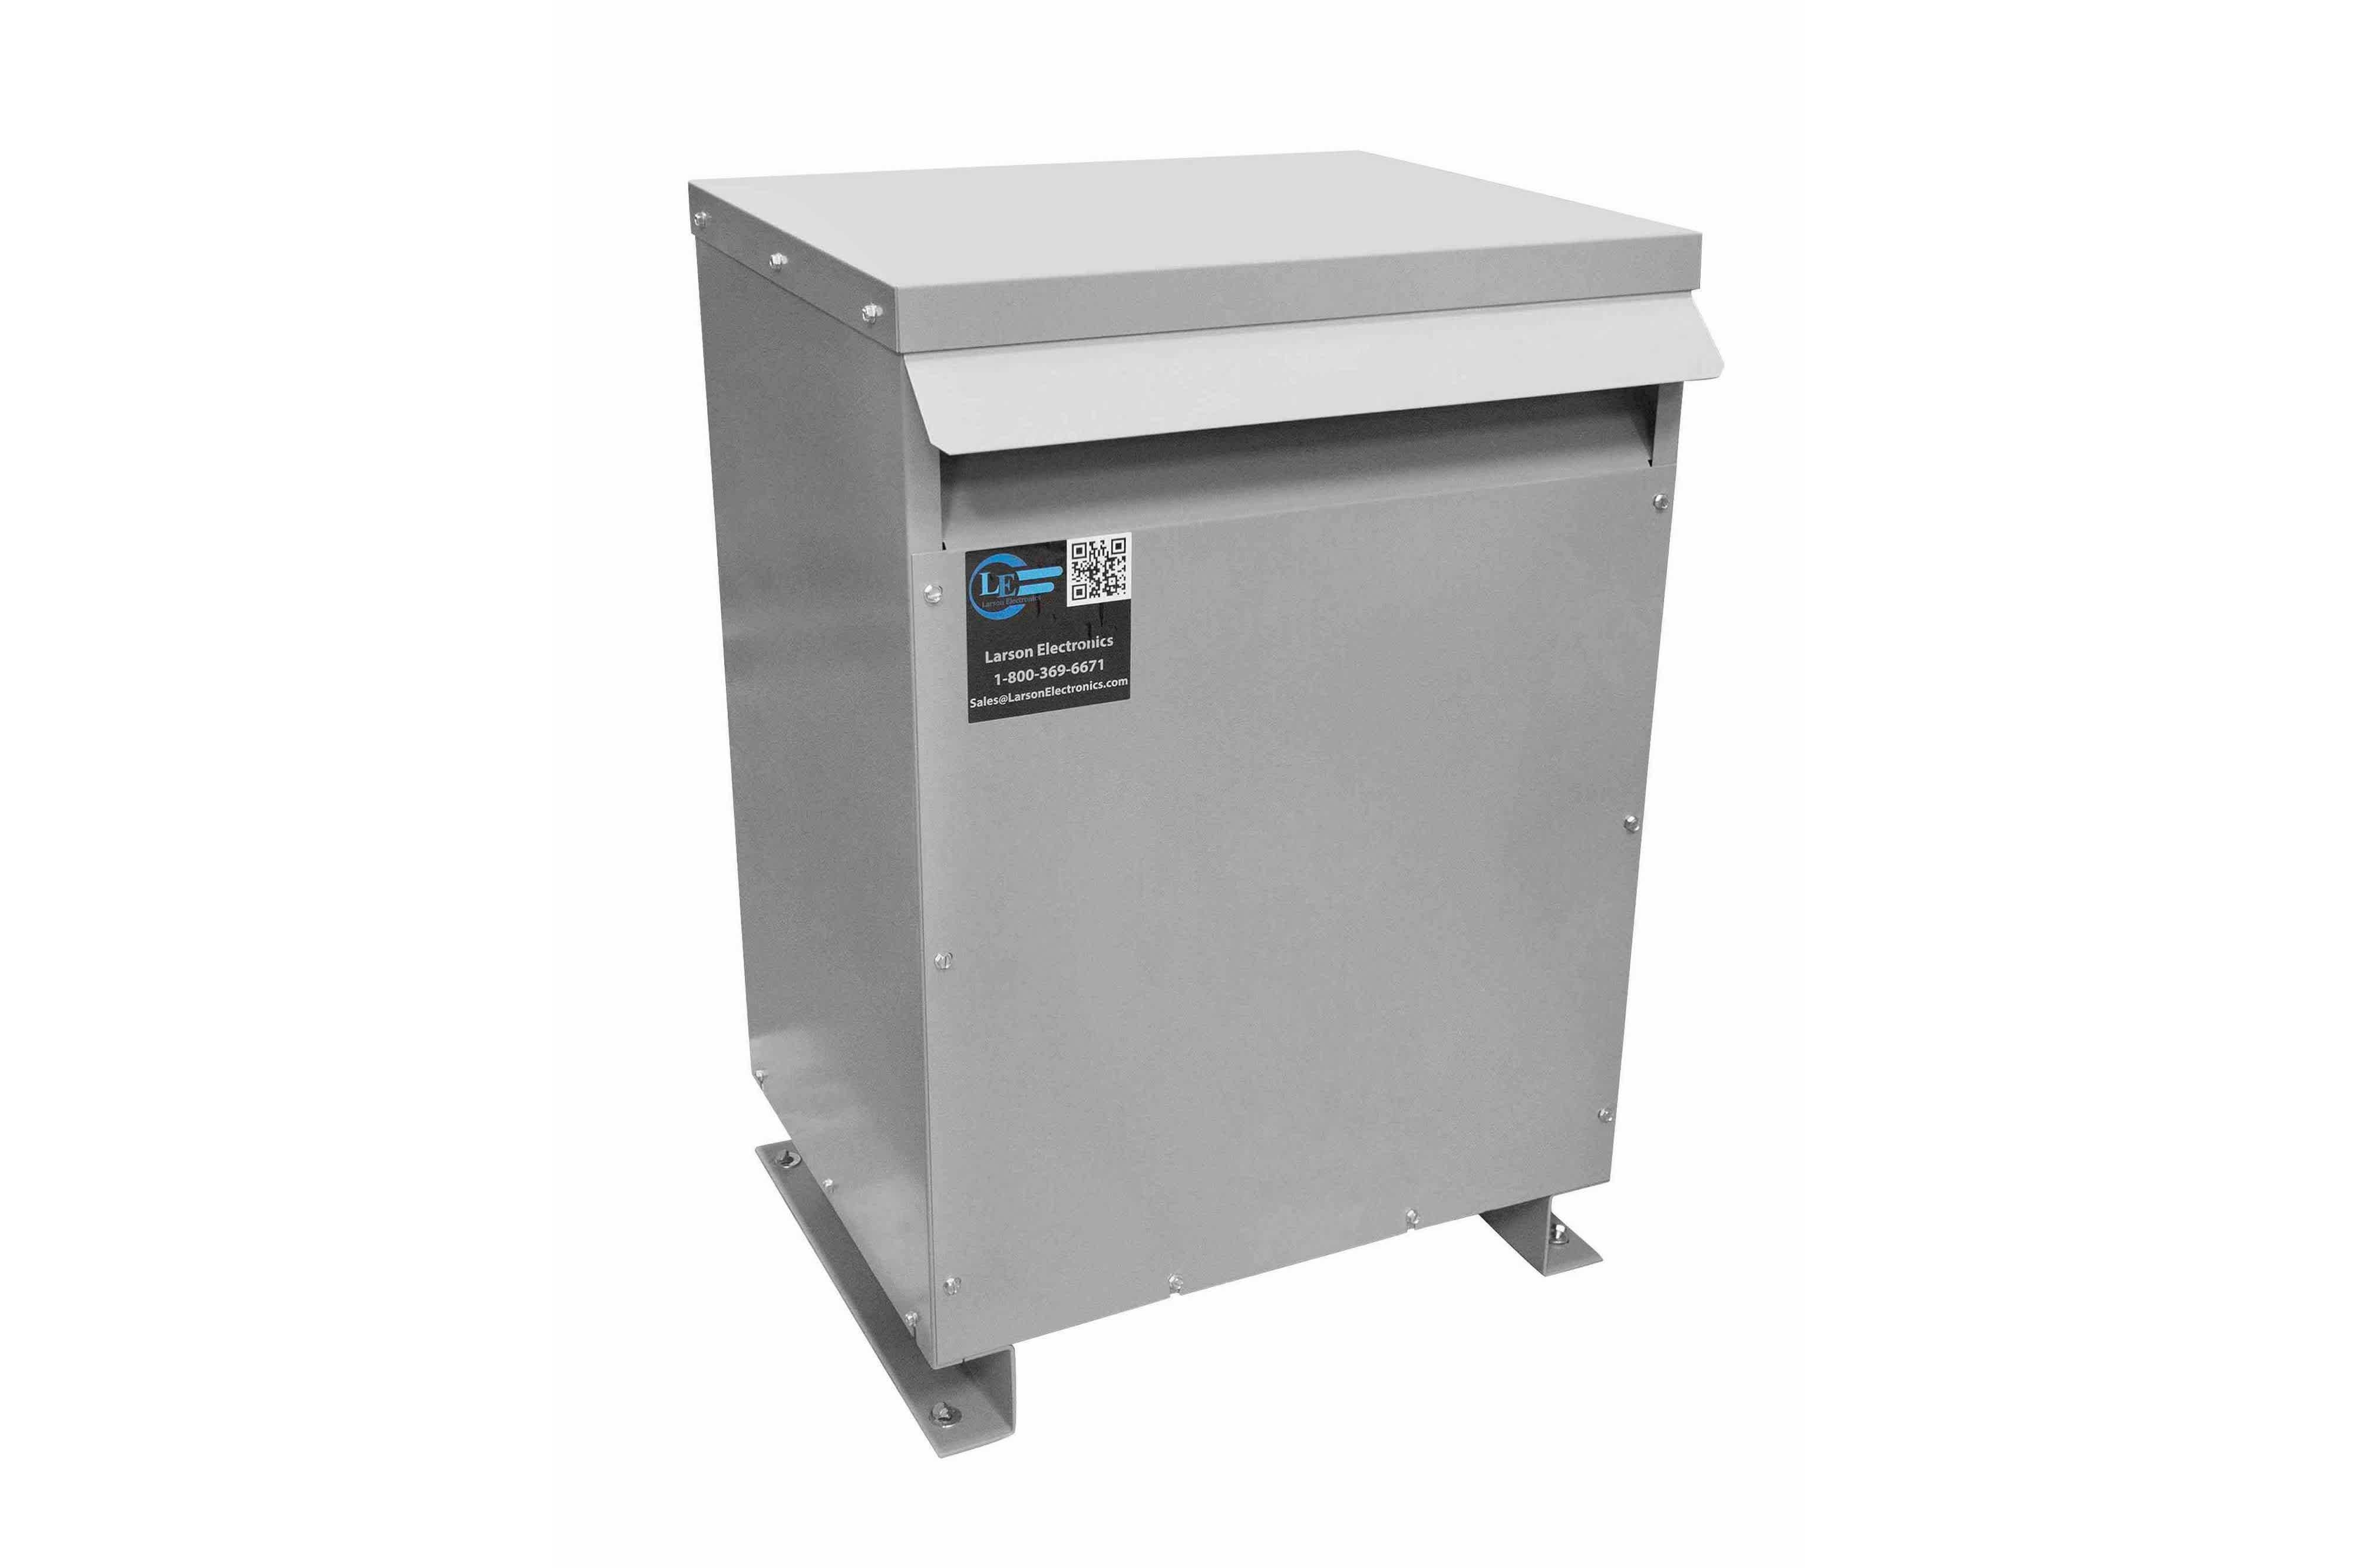 167 kVA 3PH Isolation Transformer, 415V Wye Primary, 208V Delta Secondary, N3R, Ventilated, 60 Hz